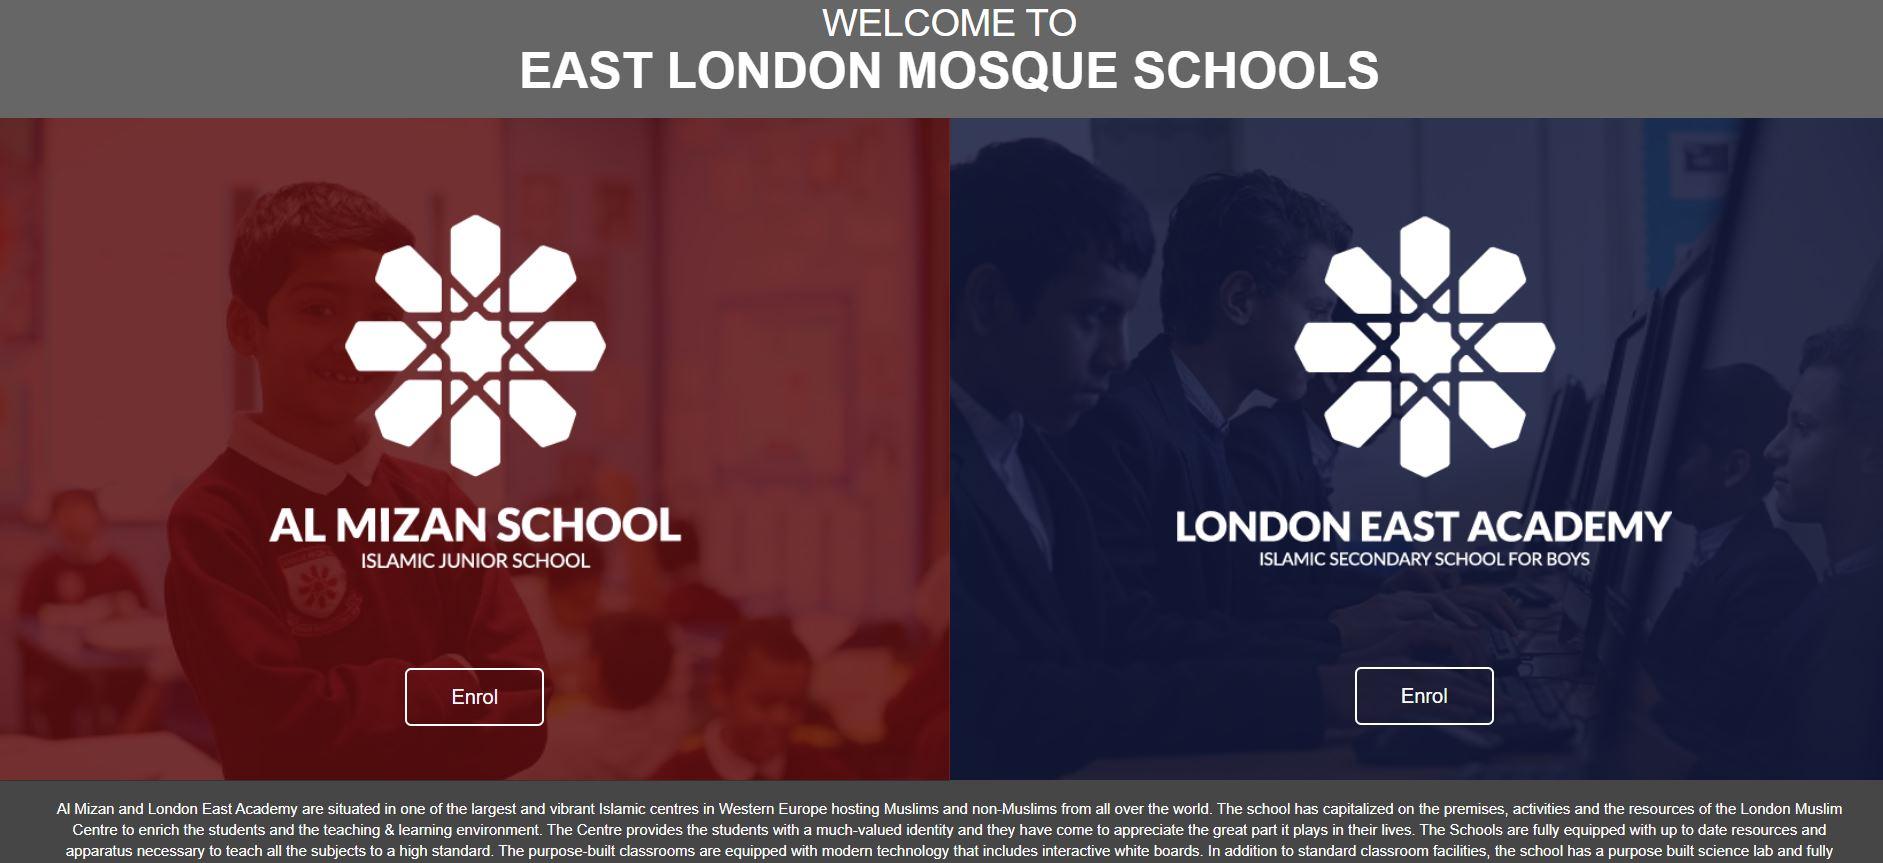 East London Mosque School